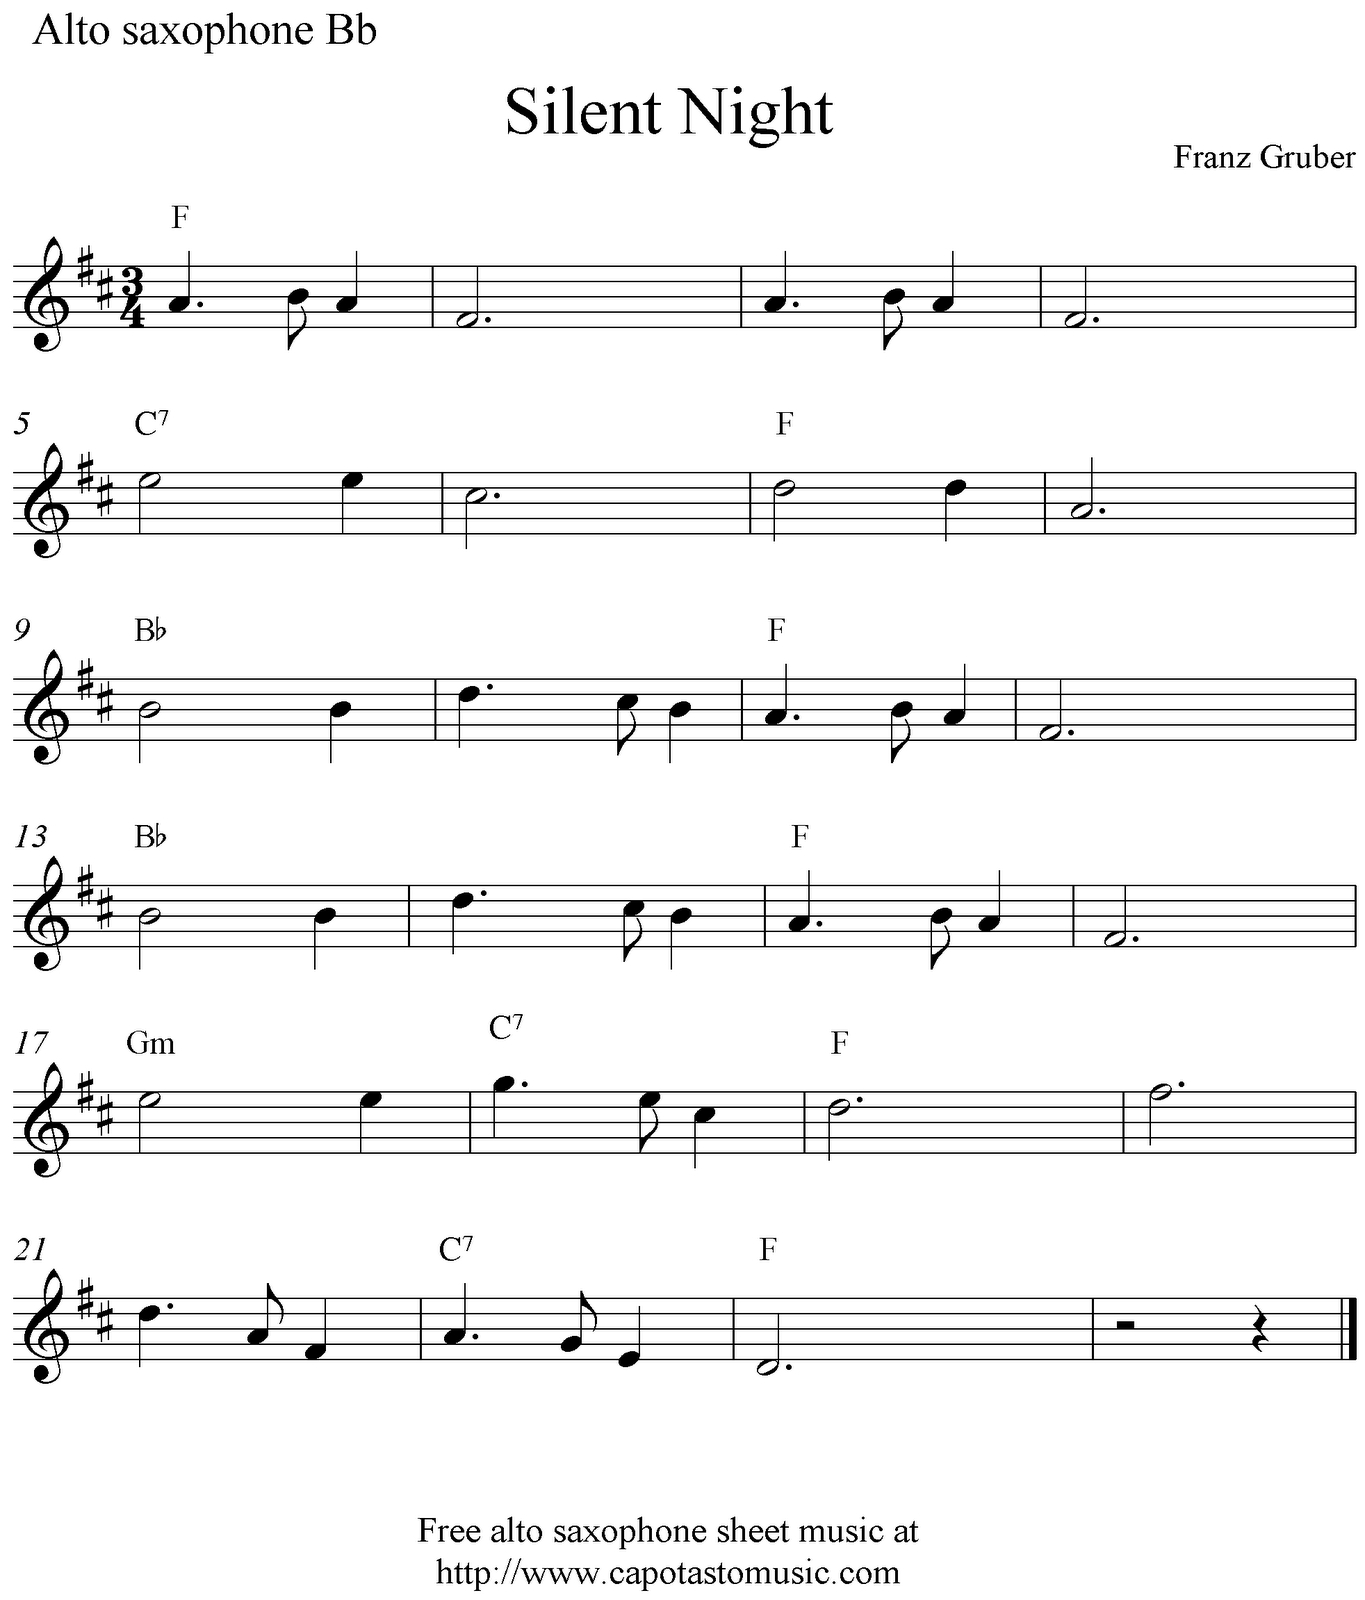 Free Printable Christmas Sheet Music For Alto Saxophone